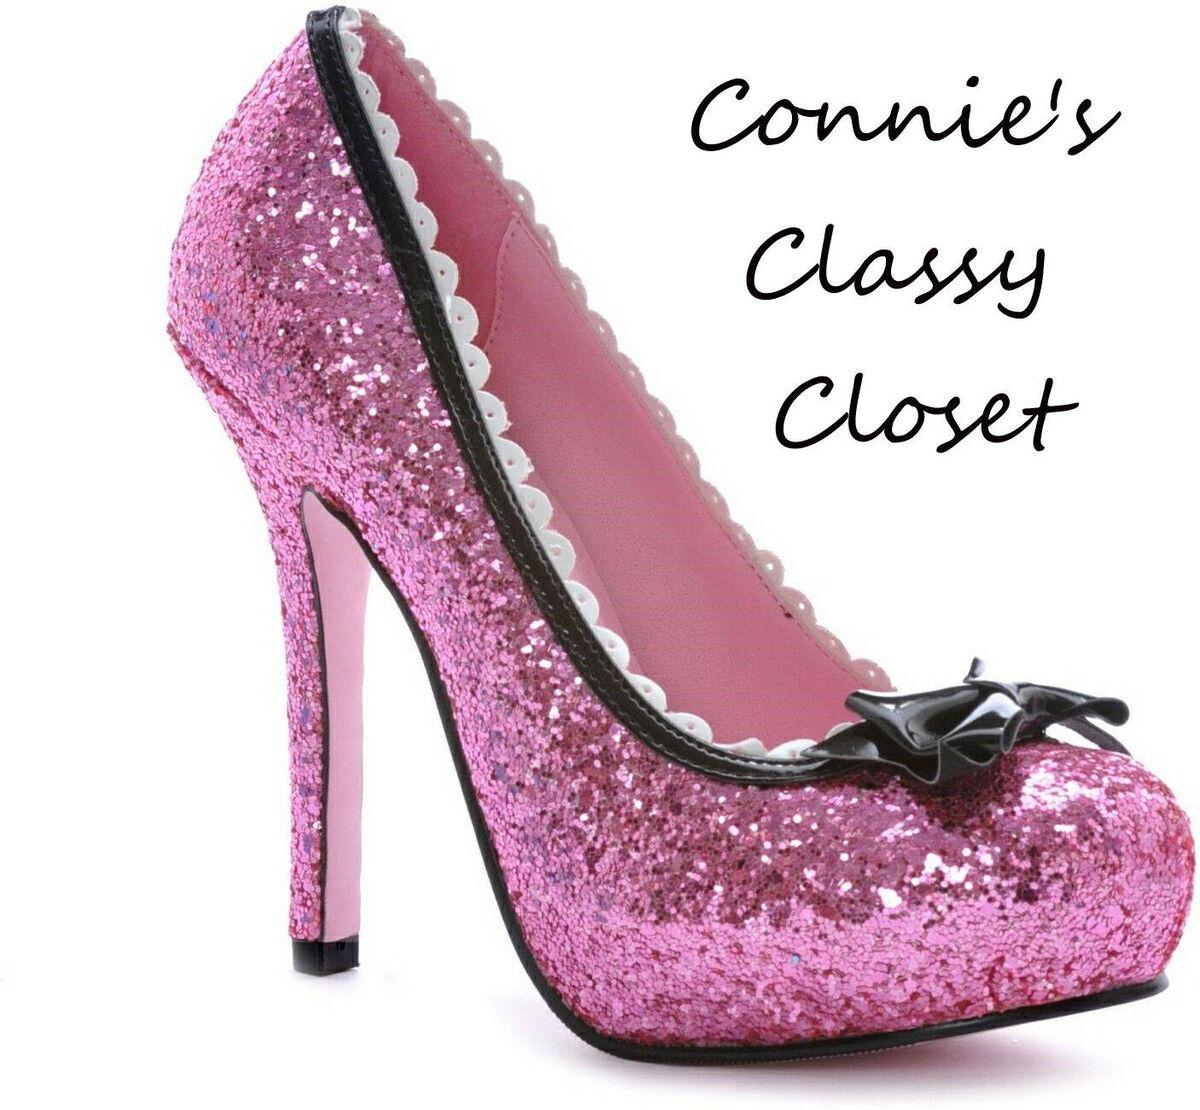 connies-classy-closet